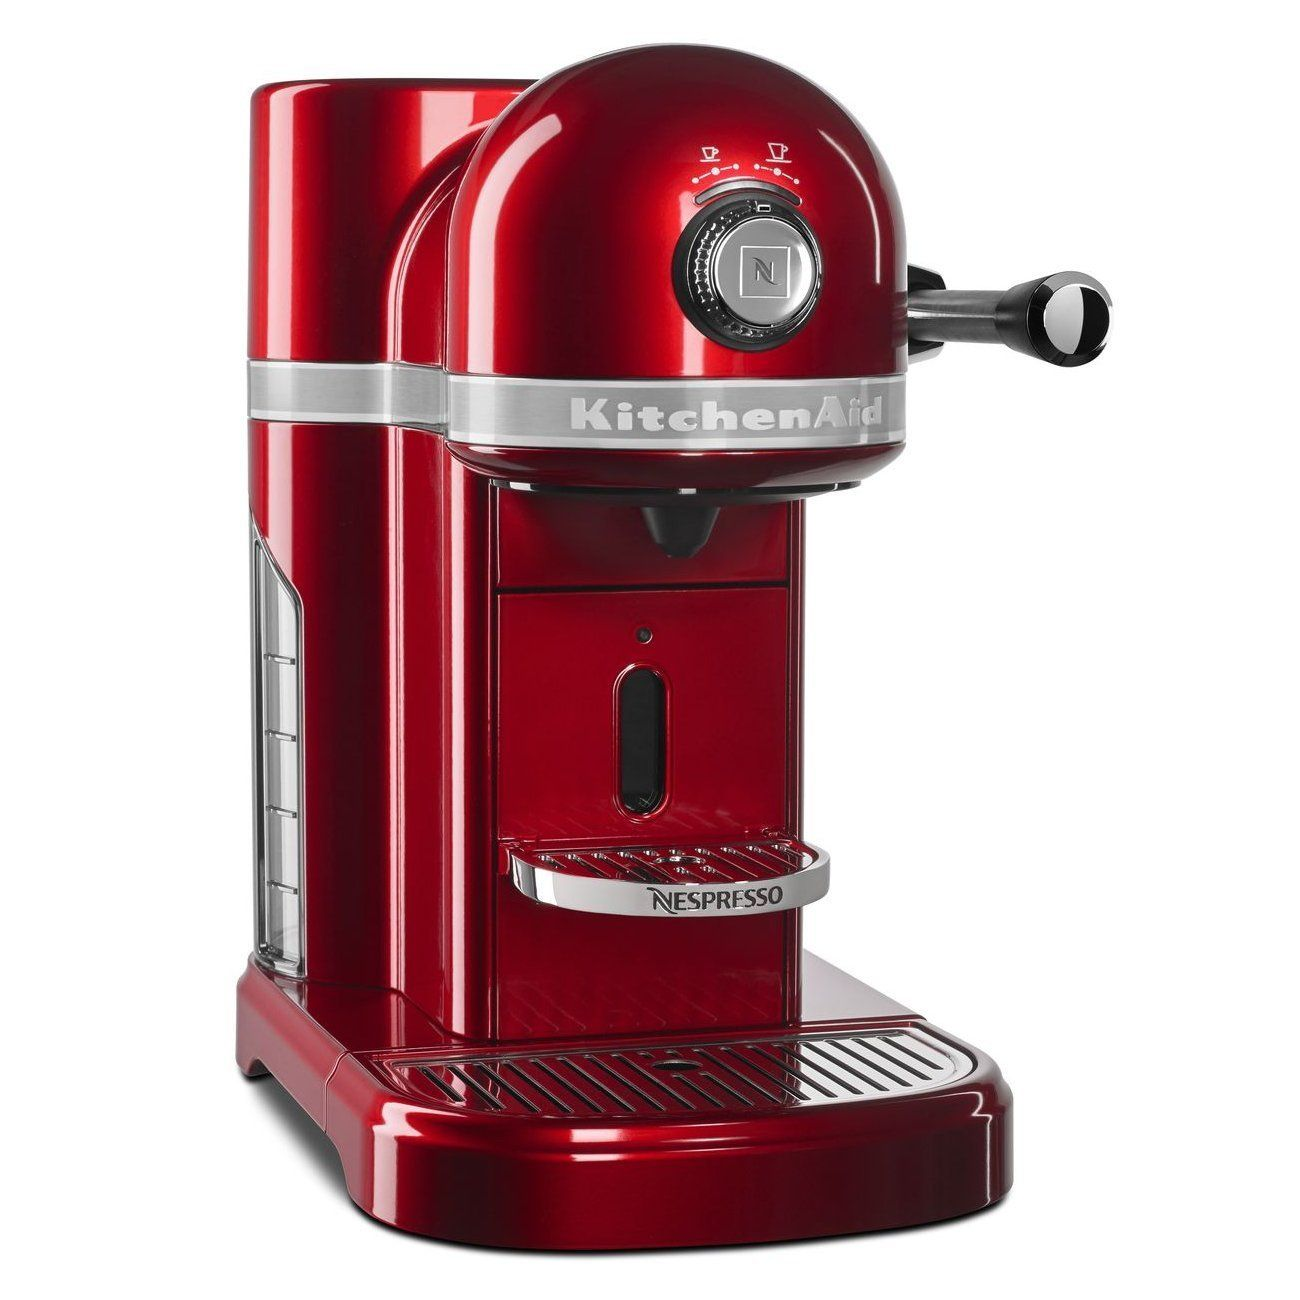 KitchenAid Candy Apple Red Nespresso Espresso Maker